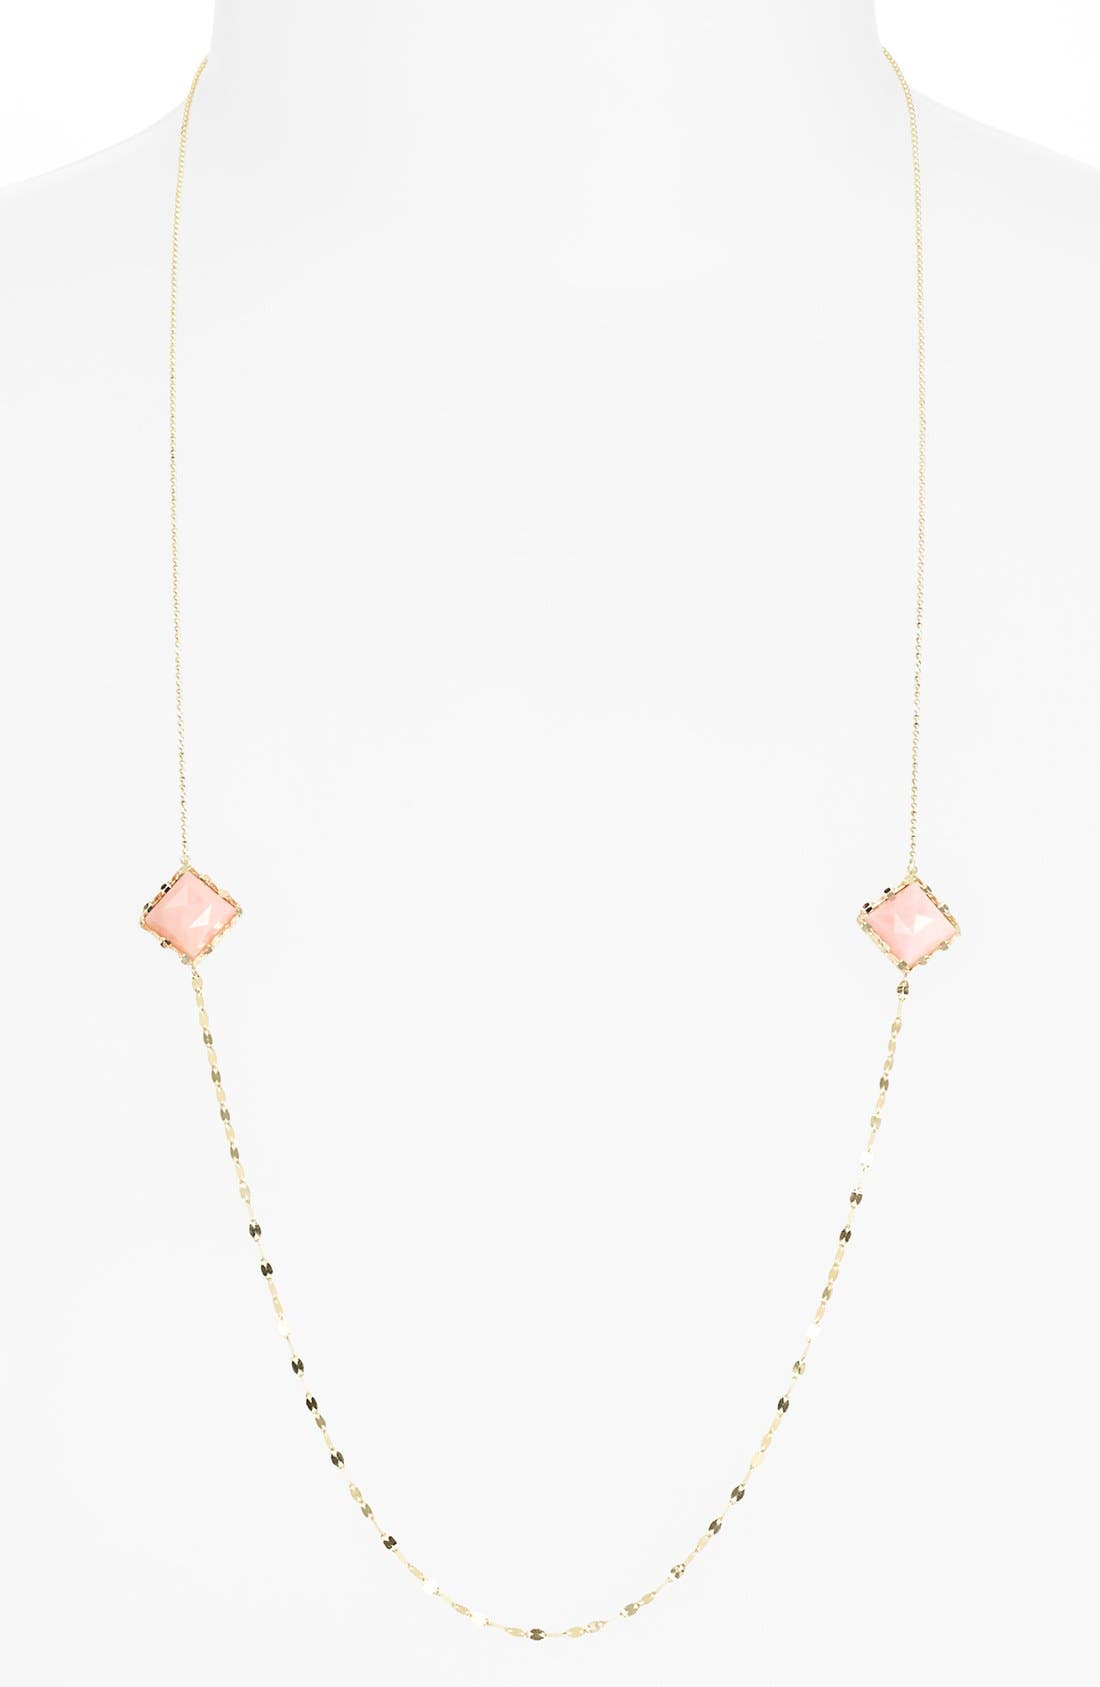 Main Image - Lana Jewelry 'Blush' Station Necklace